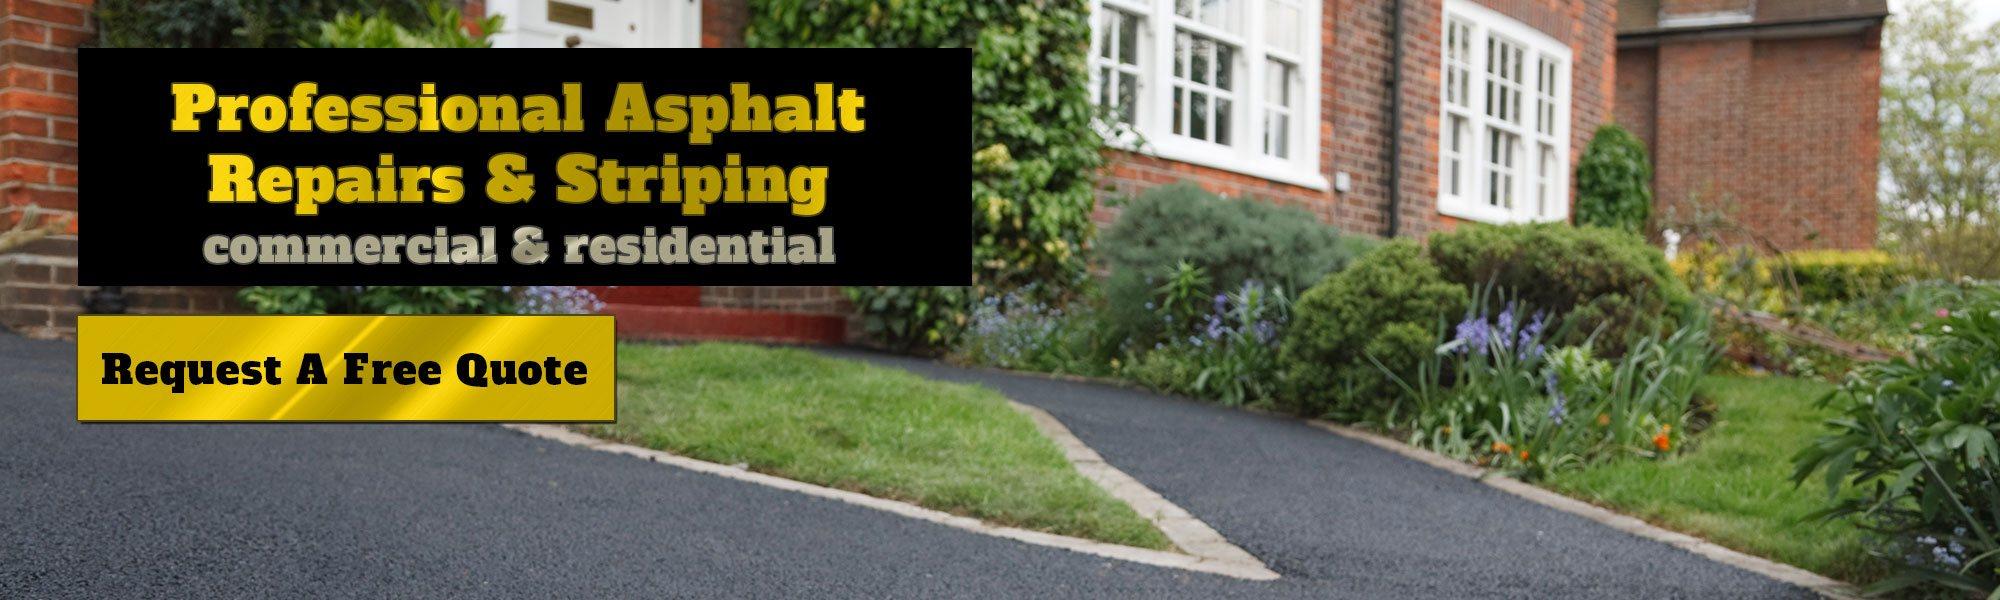 residential asphalt kansas city mo